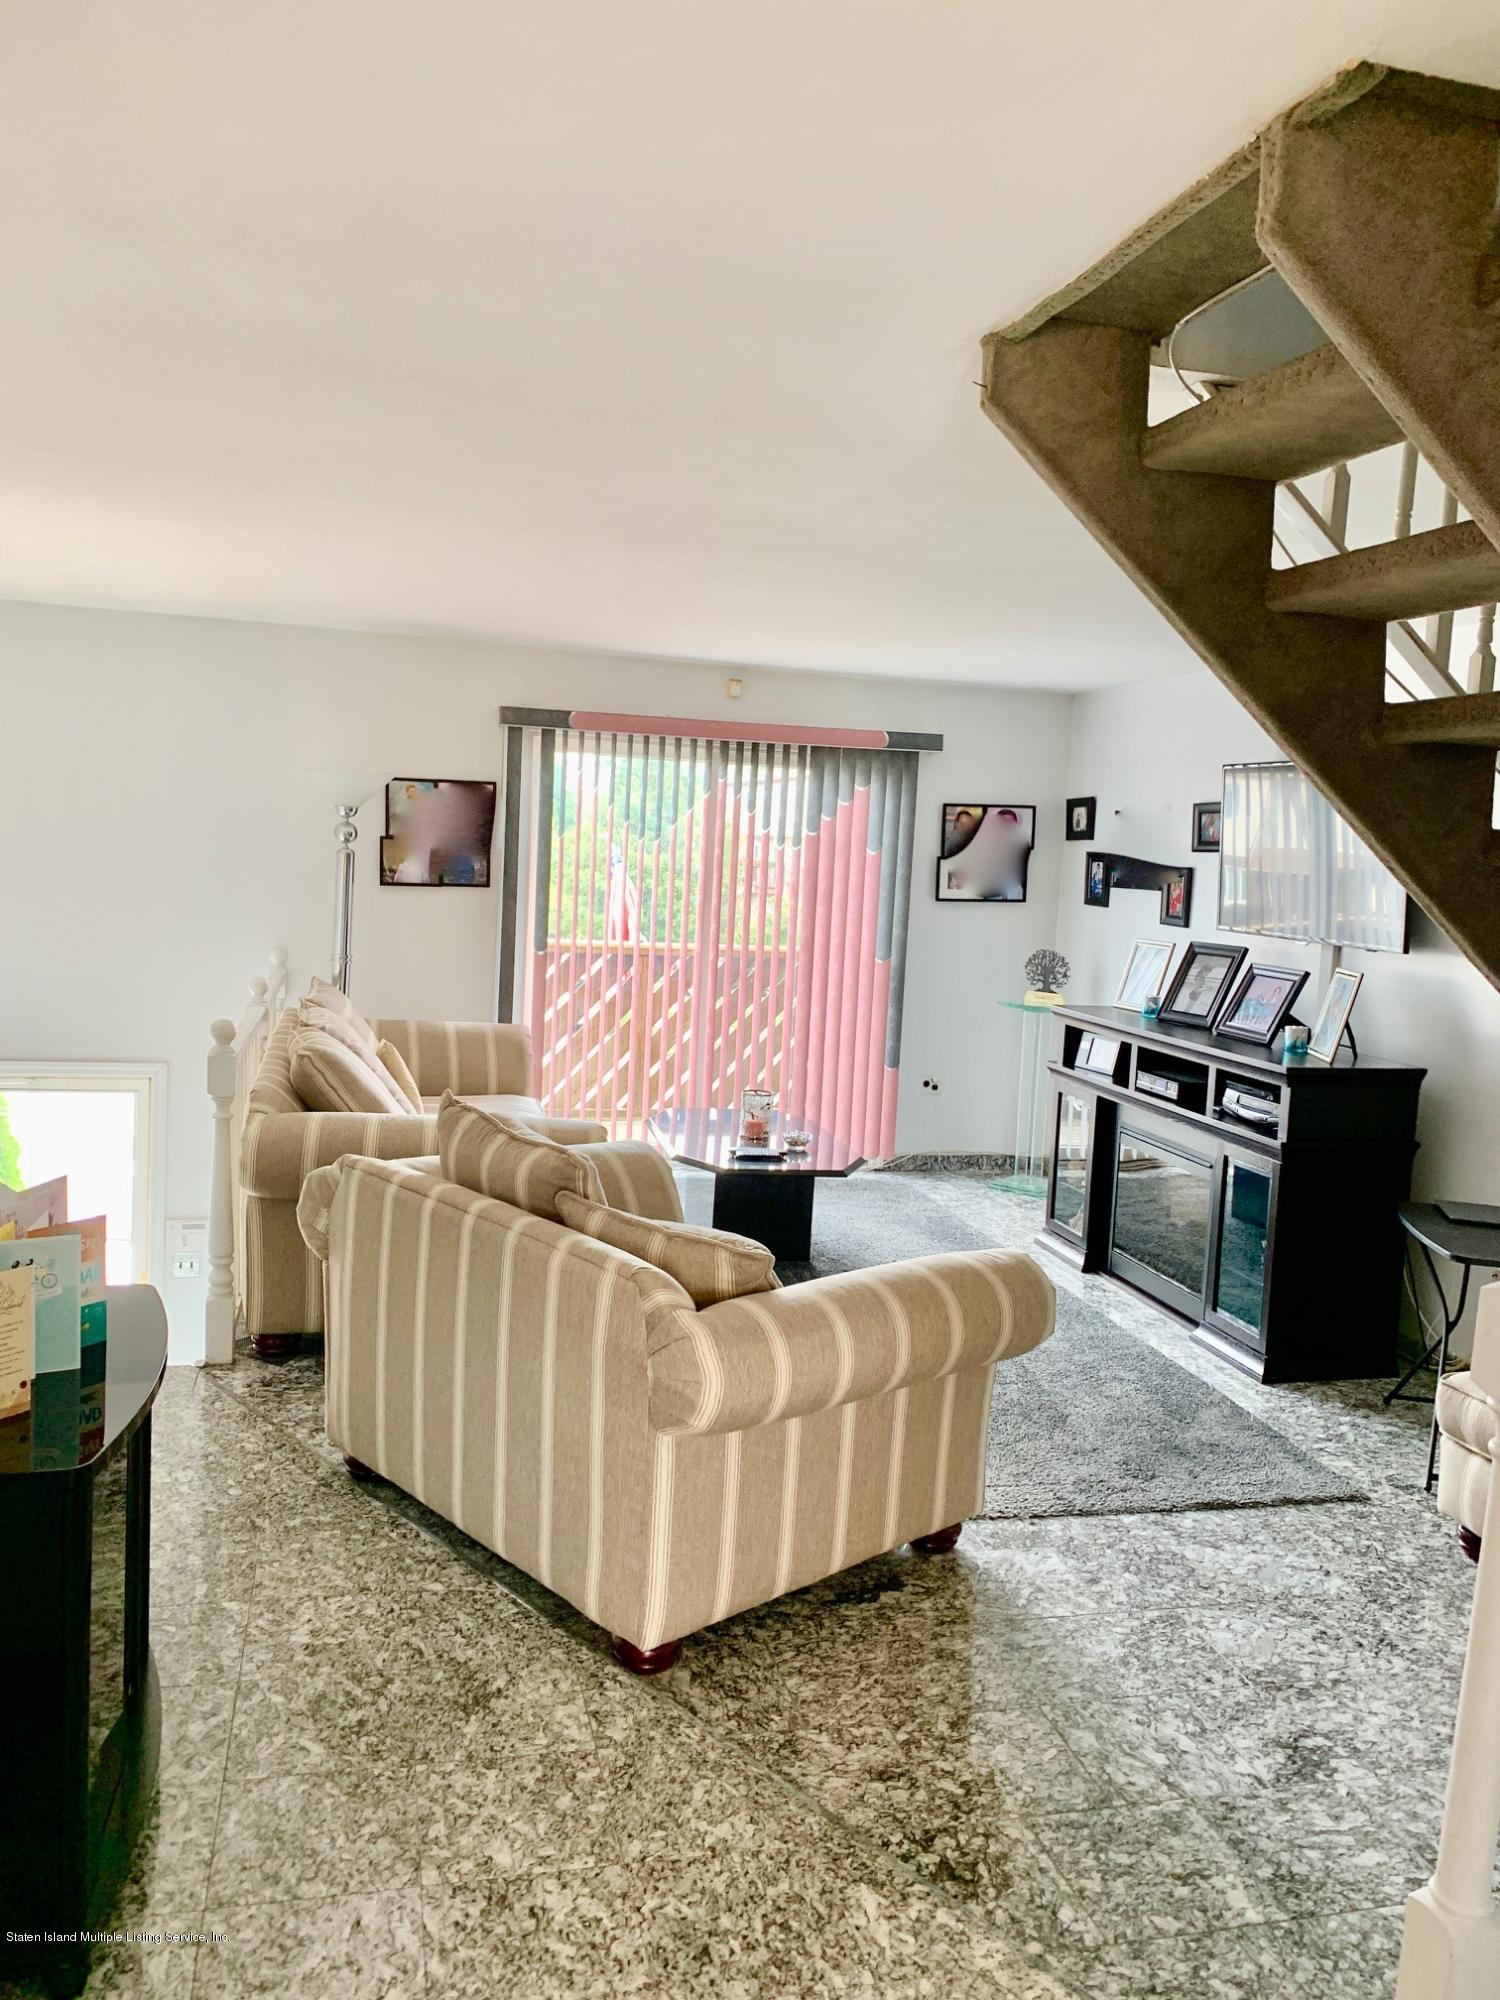 Single Family - Attached 99 Cedar Grove   Staten Island, NY 10306, MLS-1132231-9